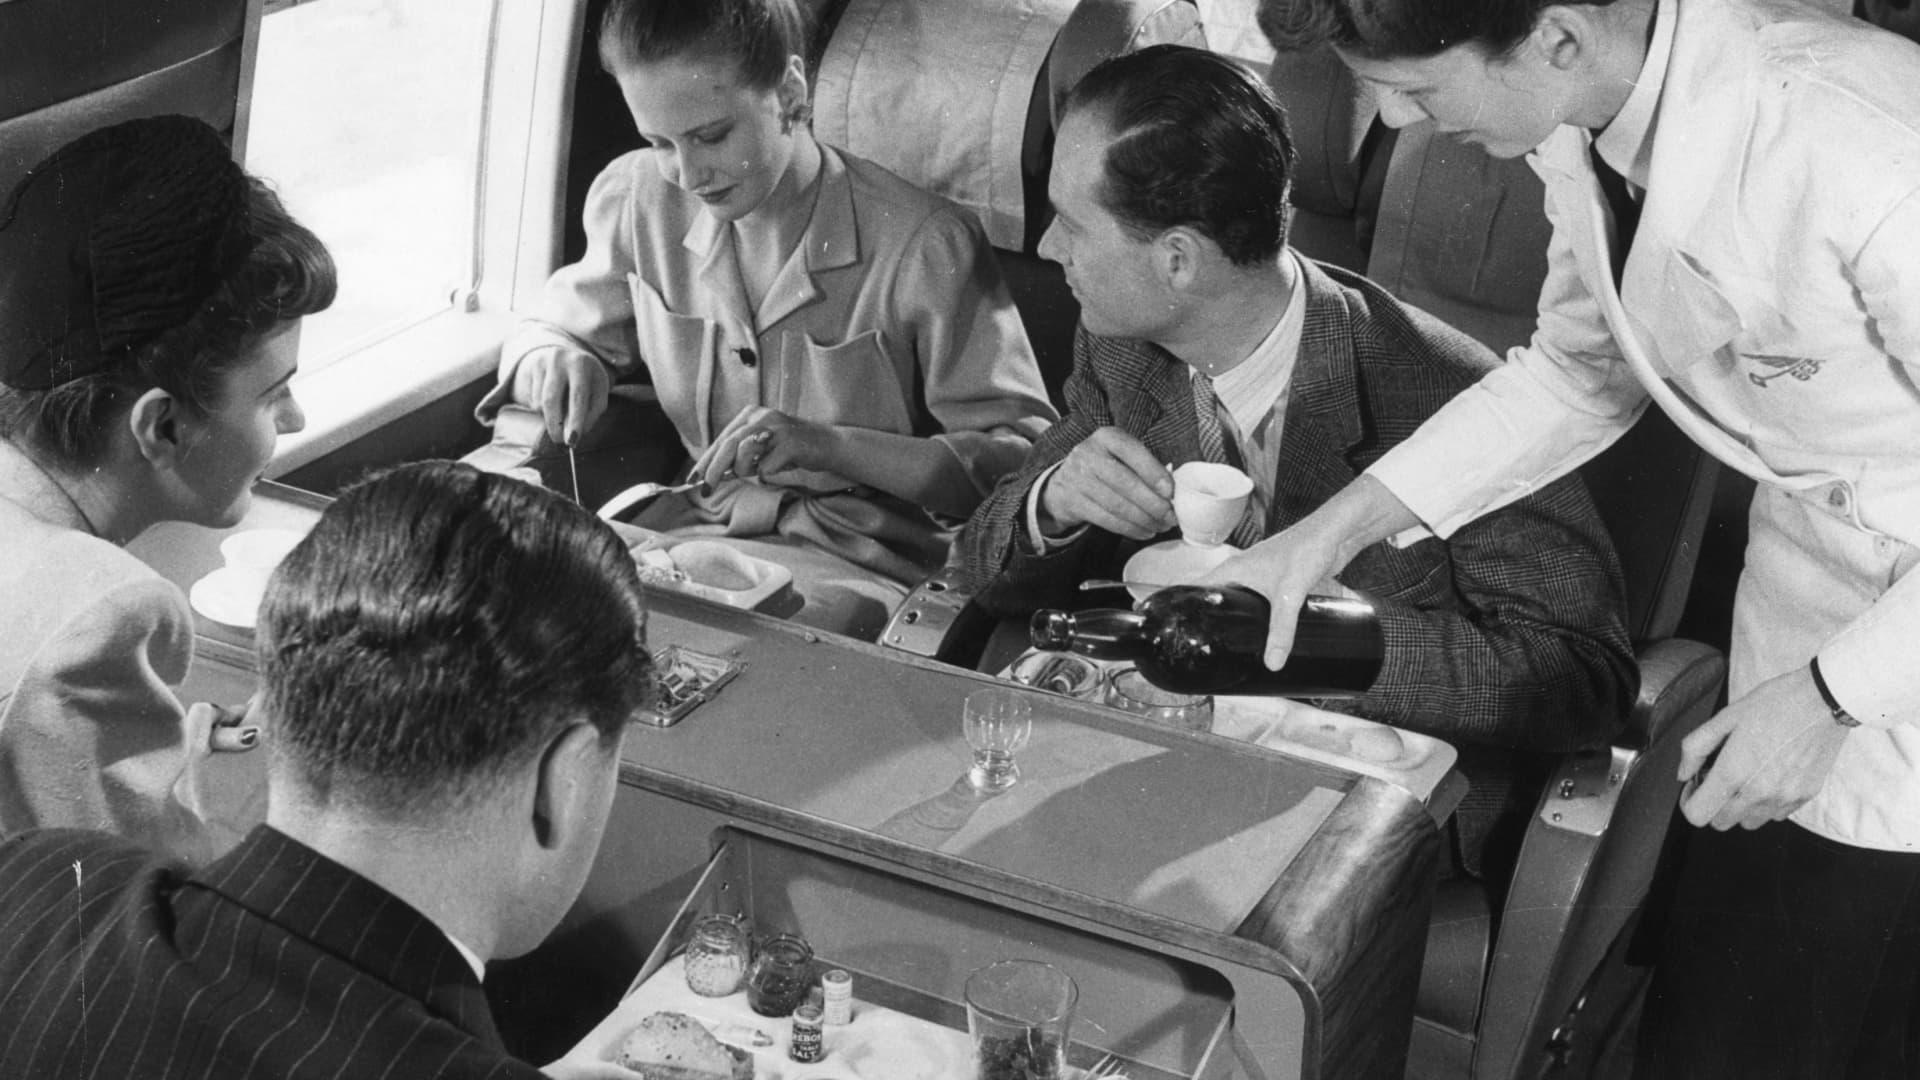 Passengers eat aboard a BEA Vickers Viking plane, circa 1958.